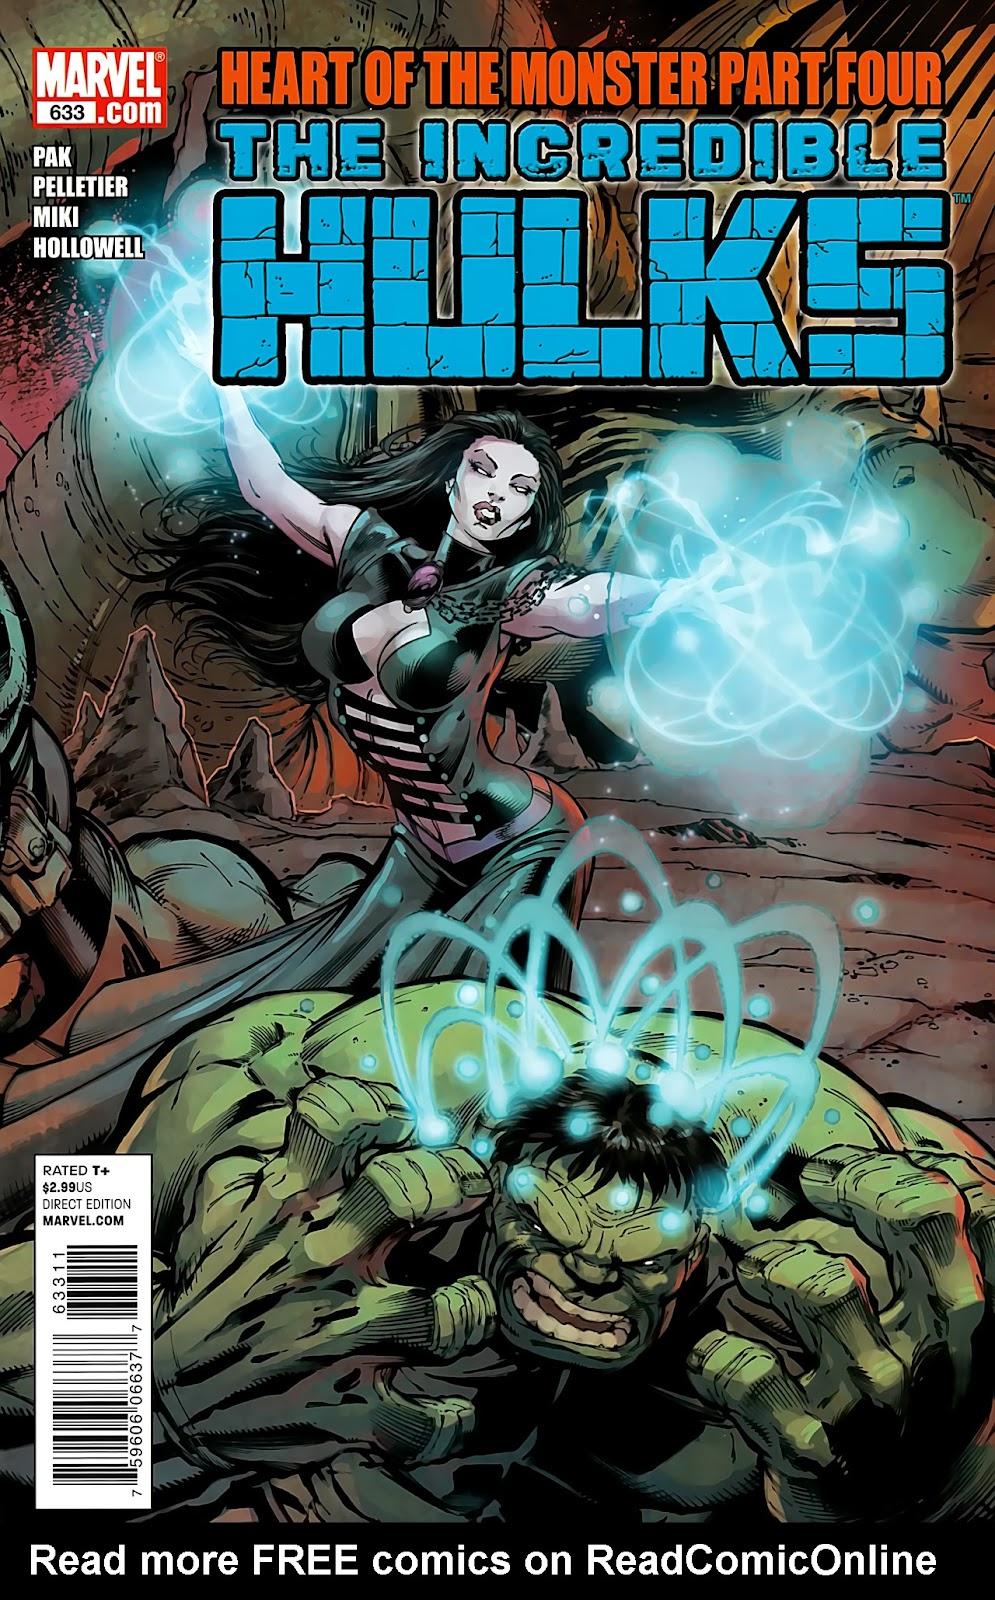 Incredible Hulks (2010) Issue #633 #23 - English 1